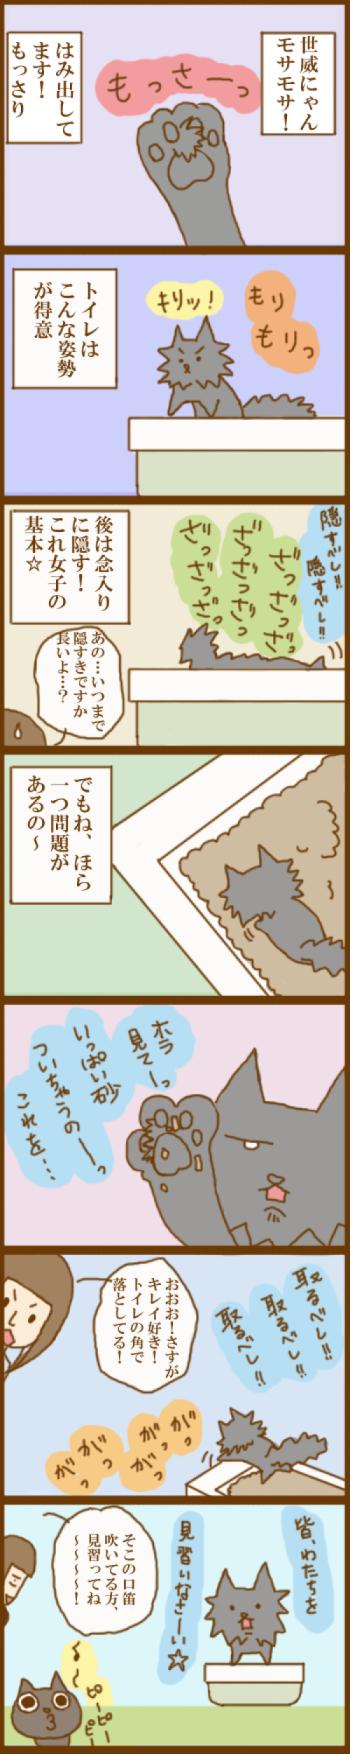 f:id:suzuokayu:20201119140249j:plain